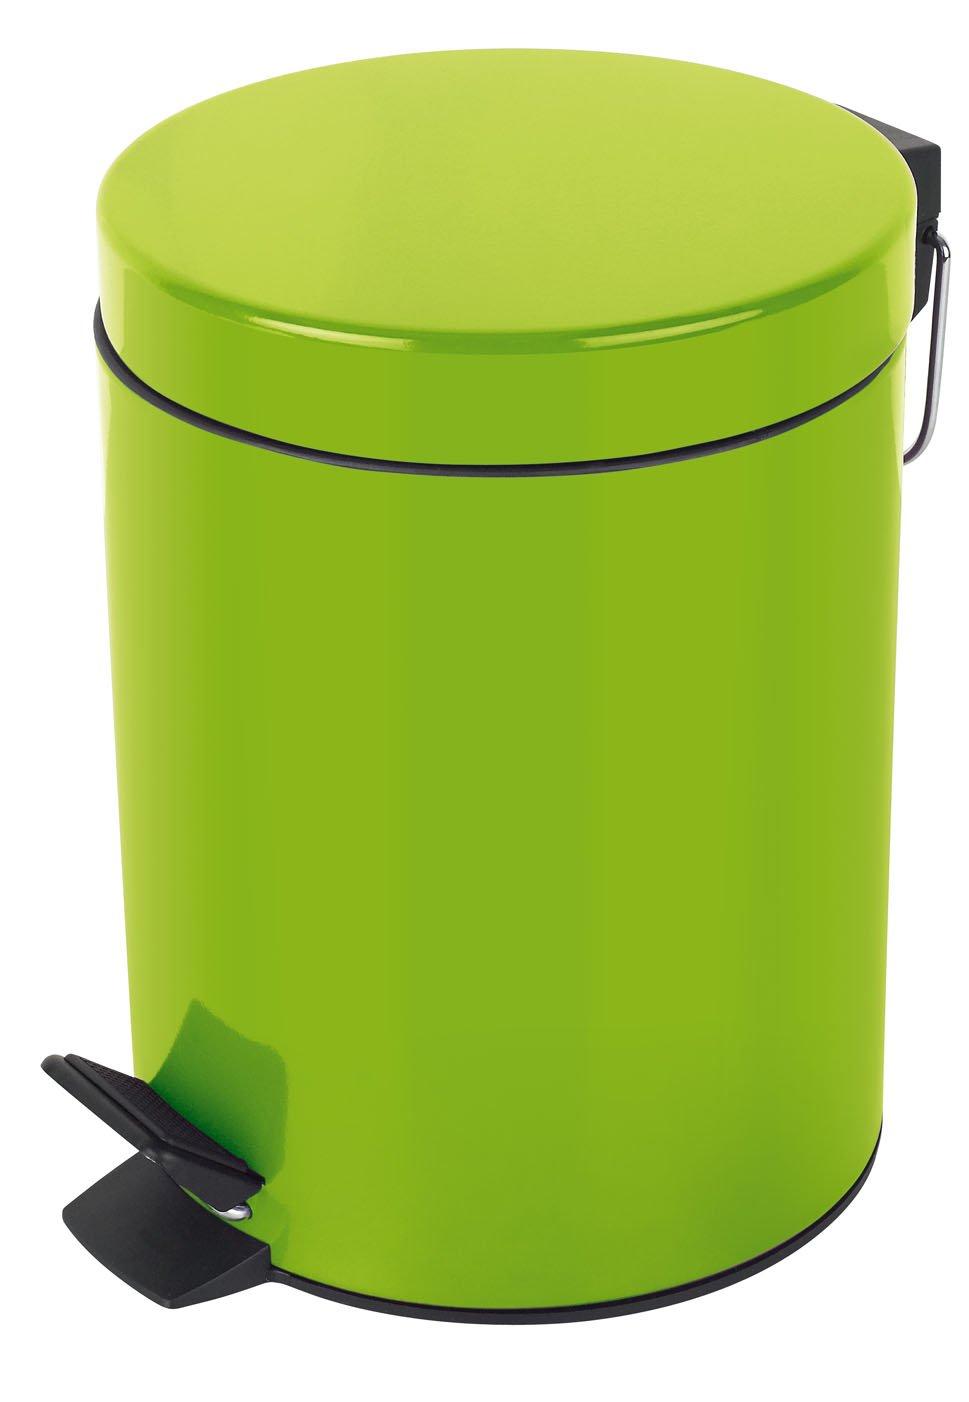 Metal Papelera con Pedal /Ø17 x 24,5 Verde Spirella colecci/ón Sydney 3 litros